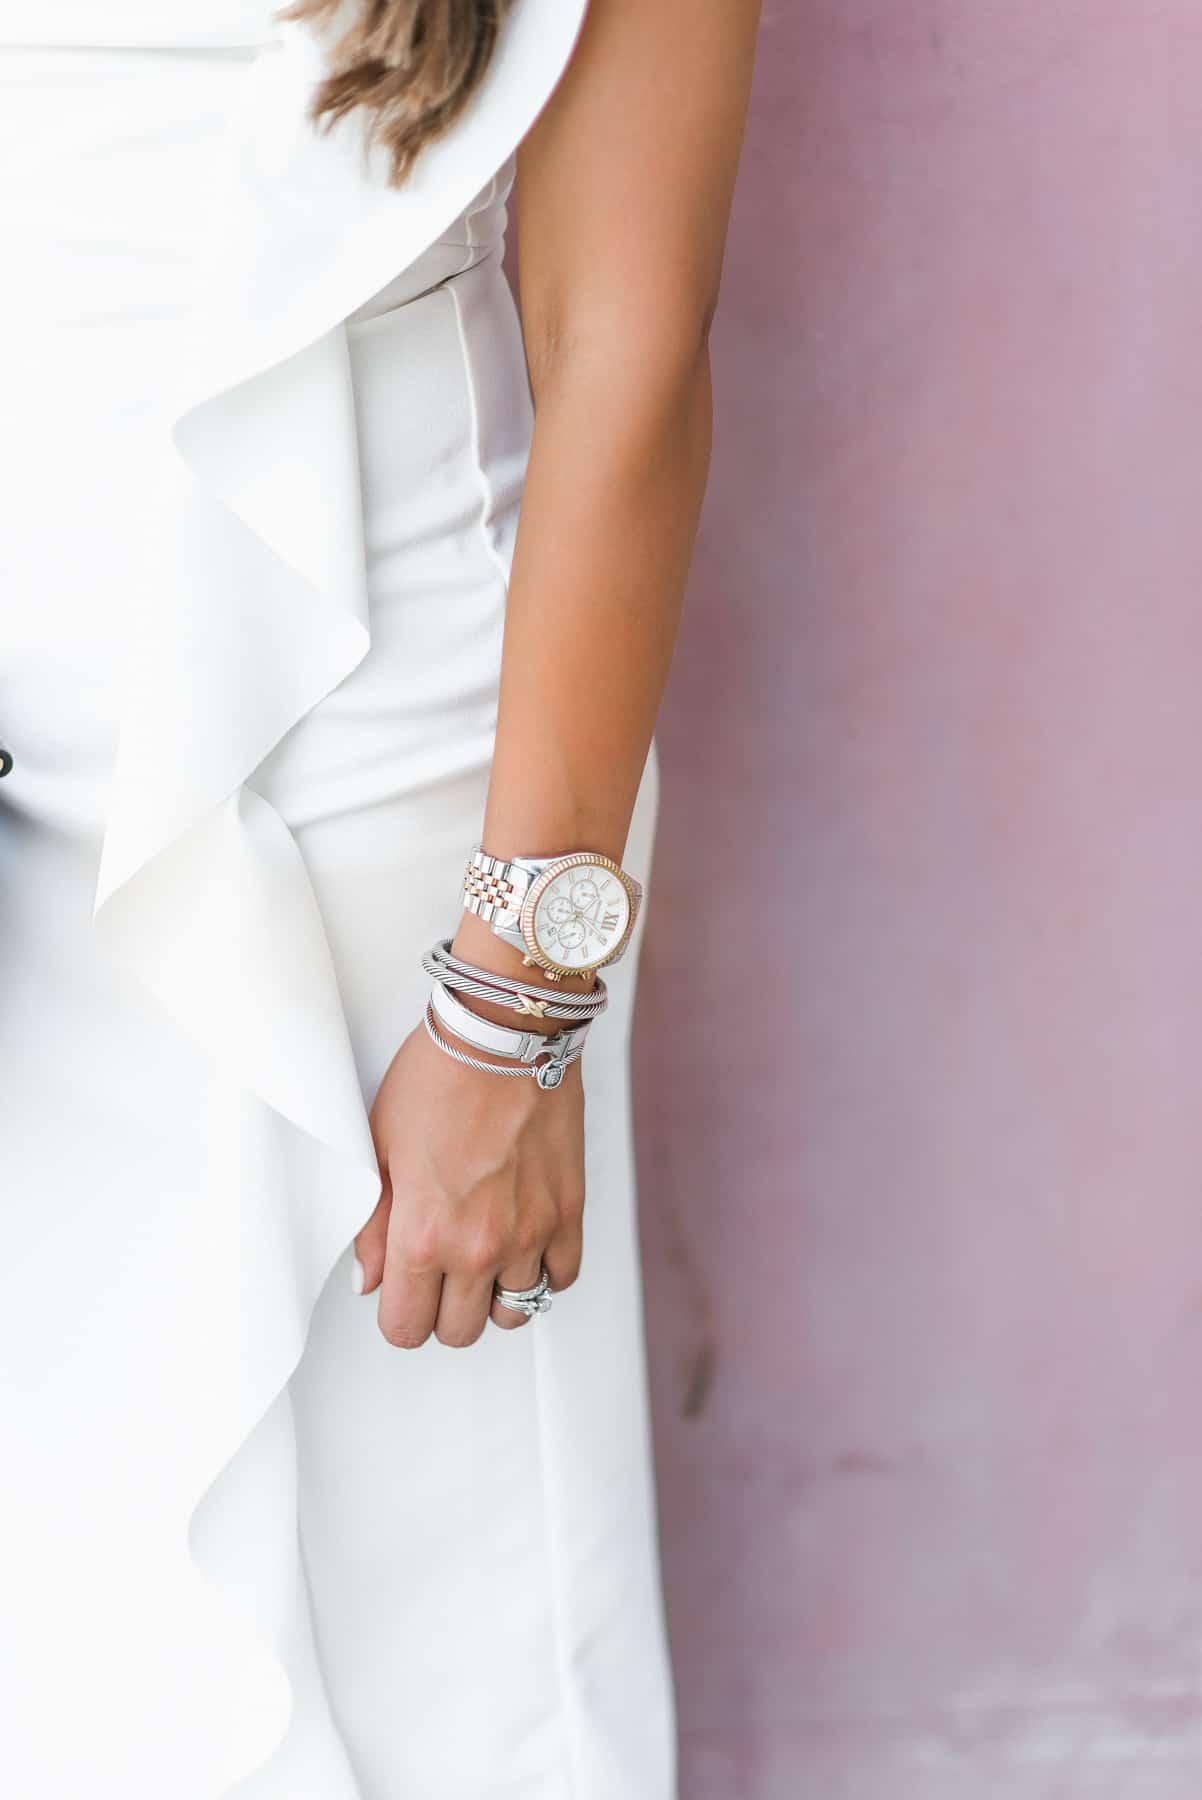 White ruffle midi dress, top shop, Nordstrom, dress up buttercup, dede raad, houston blogger, fashion blogger